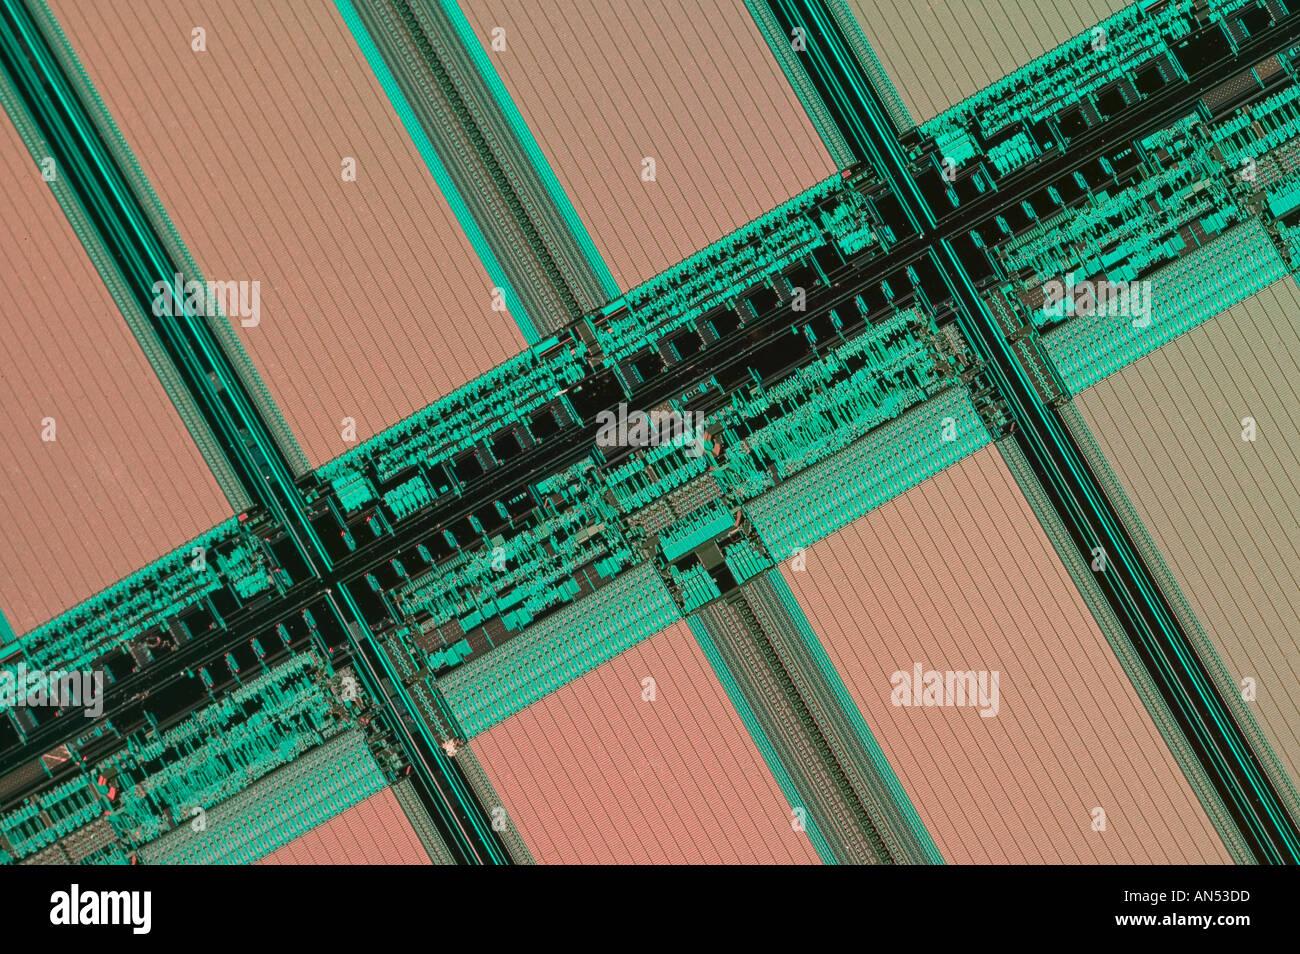 Closeup of computer chips - Stock Image